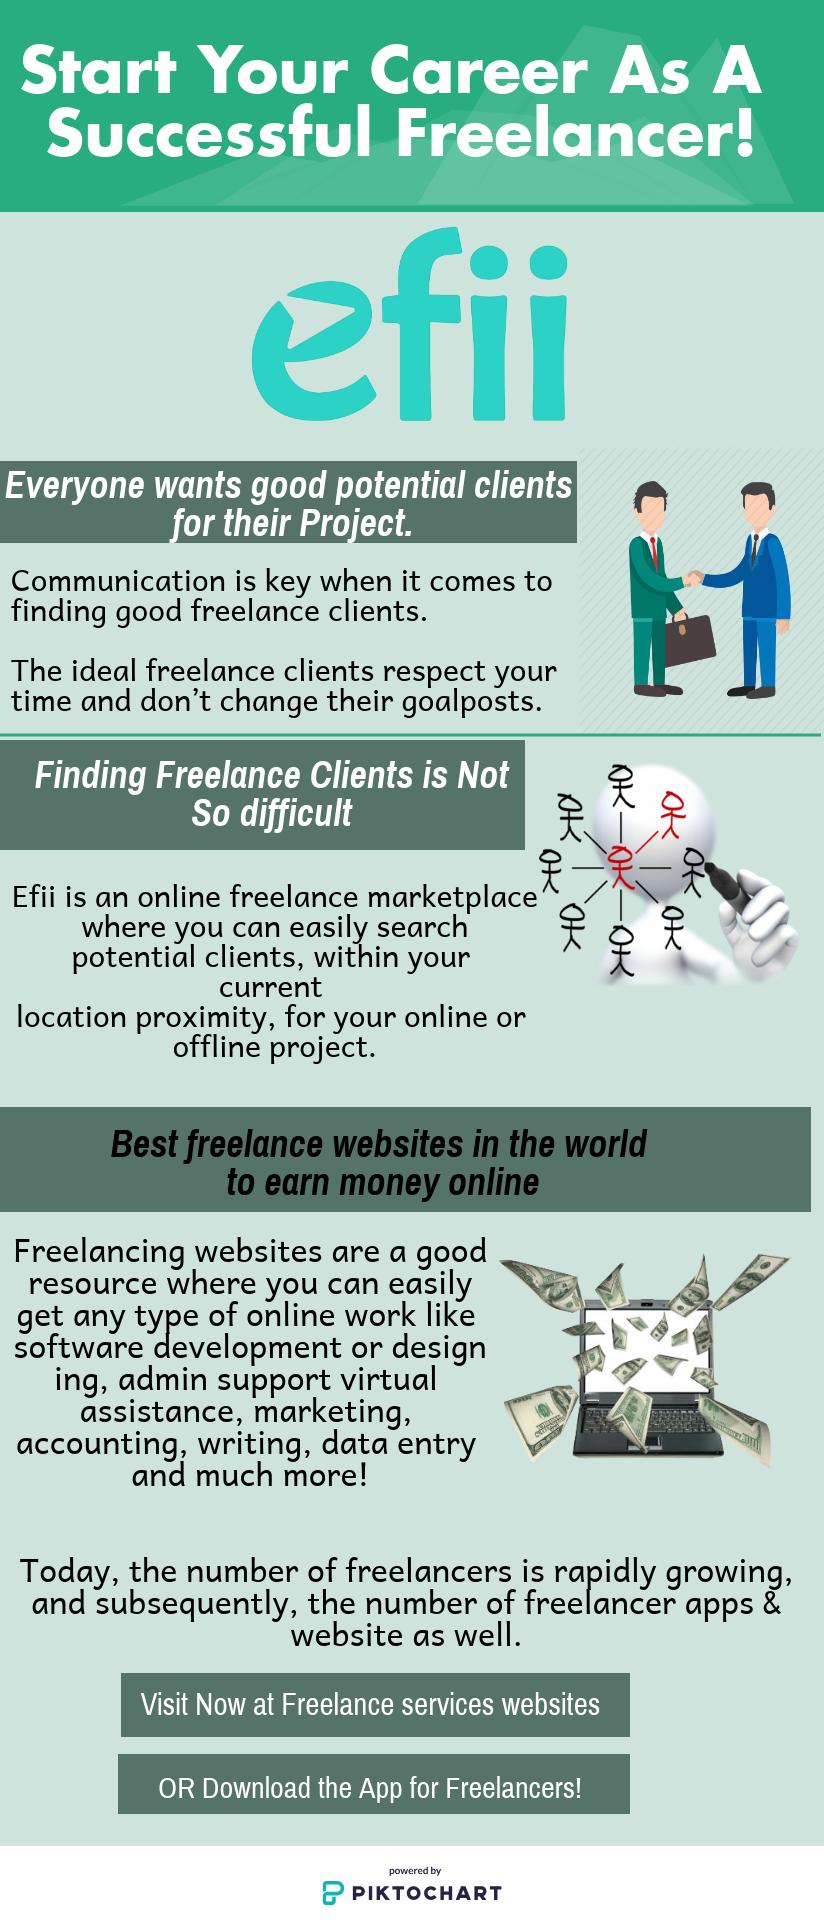 Visit Now At Freelance Services Websites Download The App For Freelancers Freelancer Website Freelance